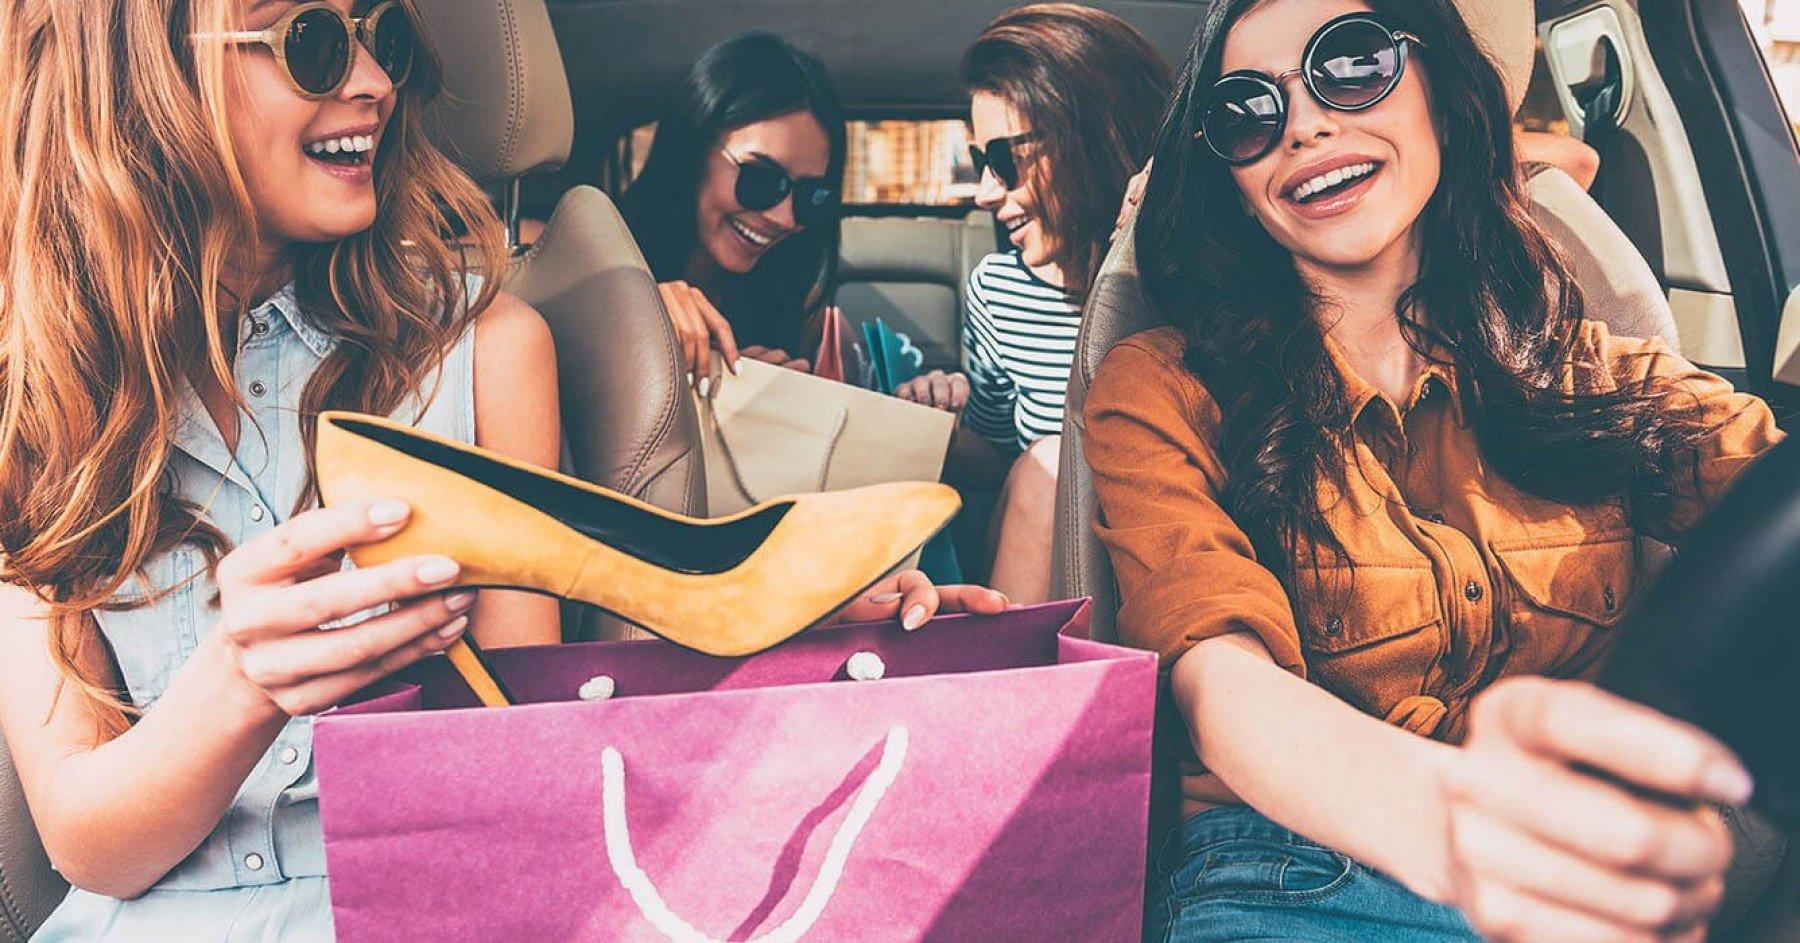 Tjejer i en bil med shoppingkassar